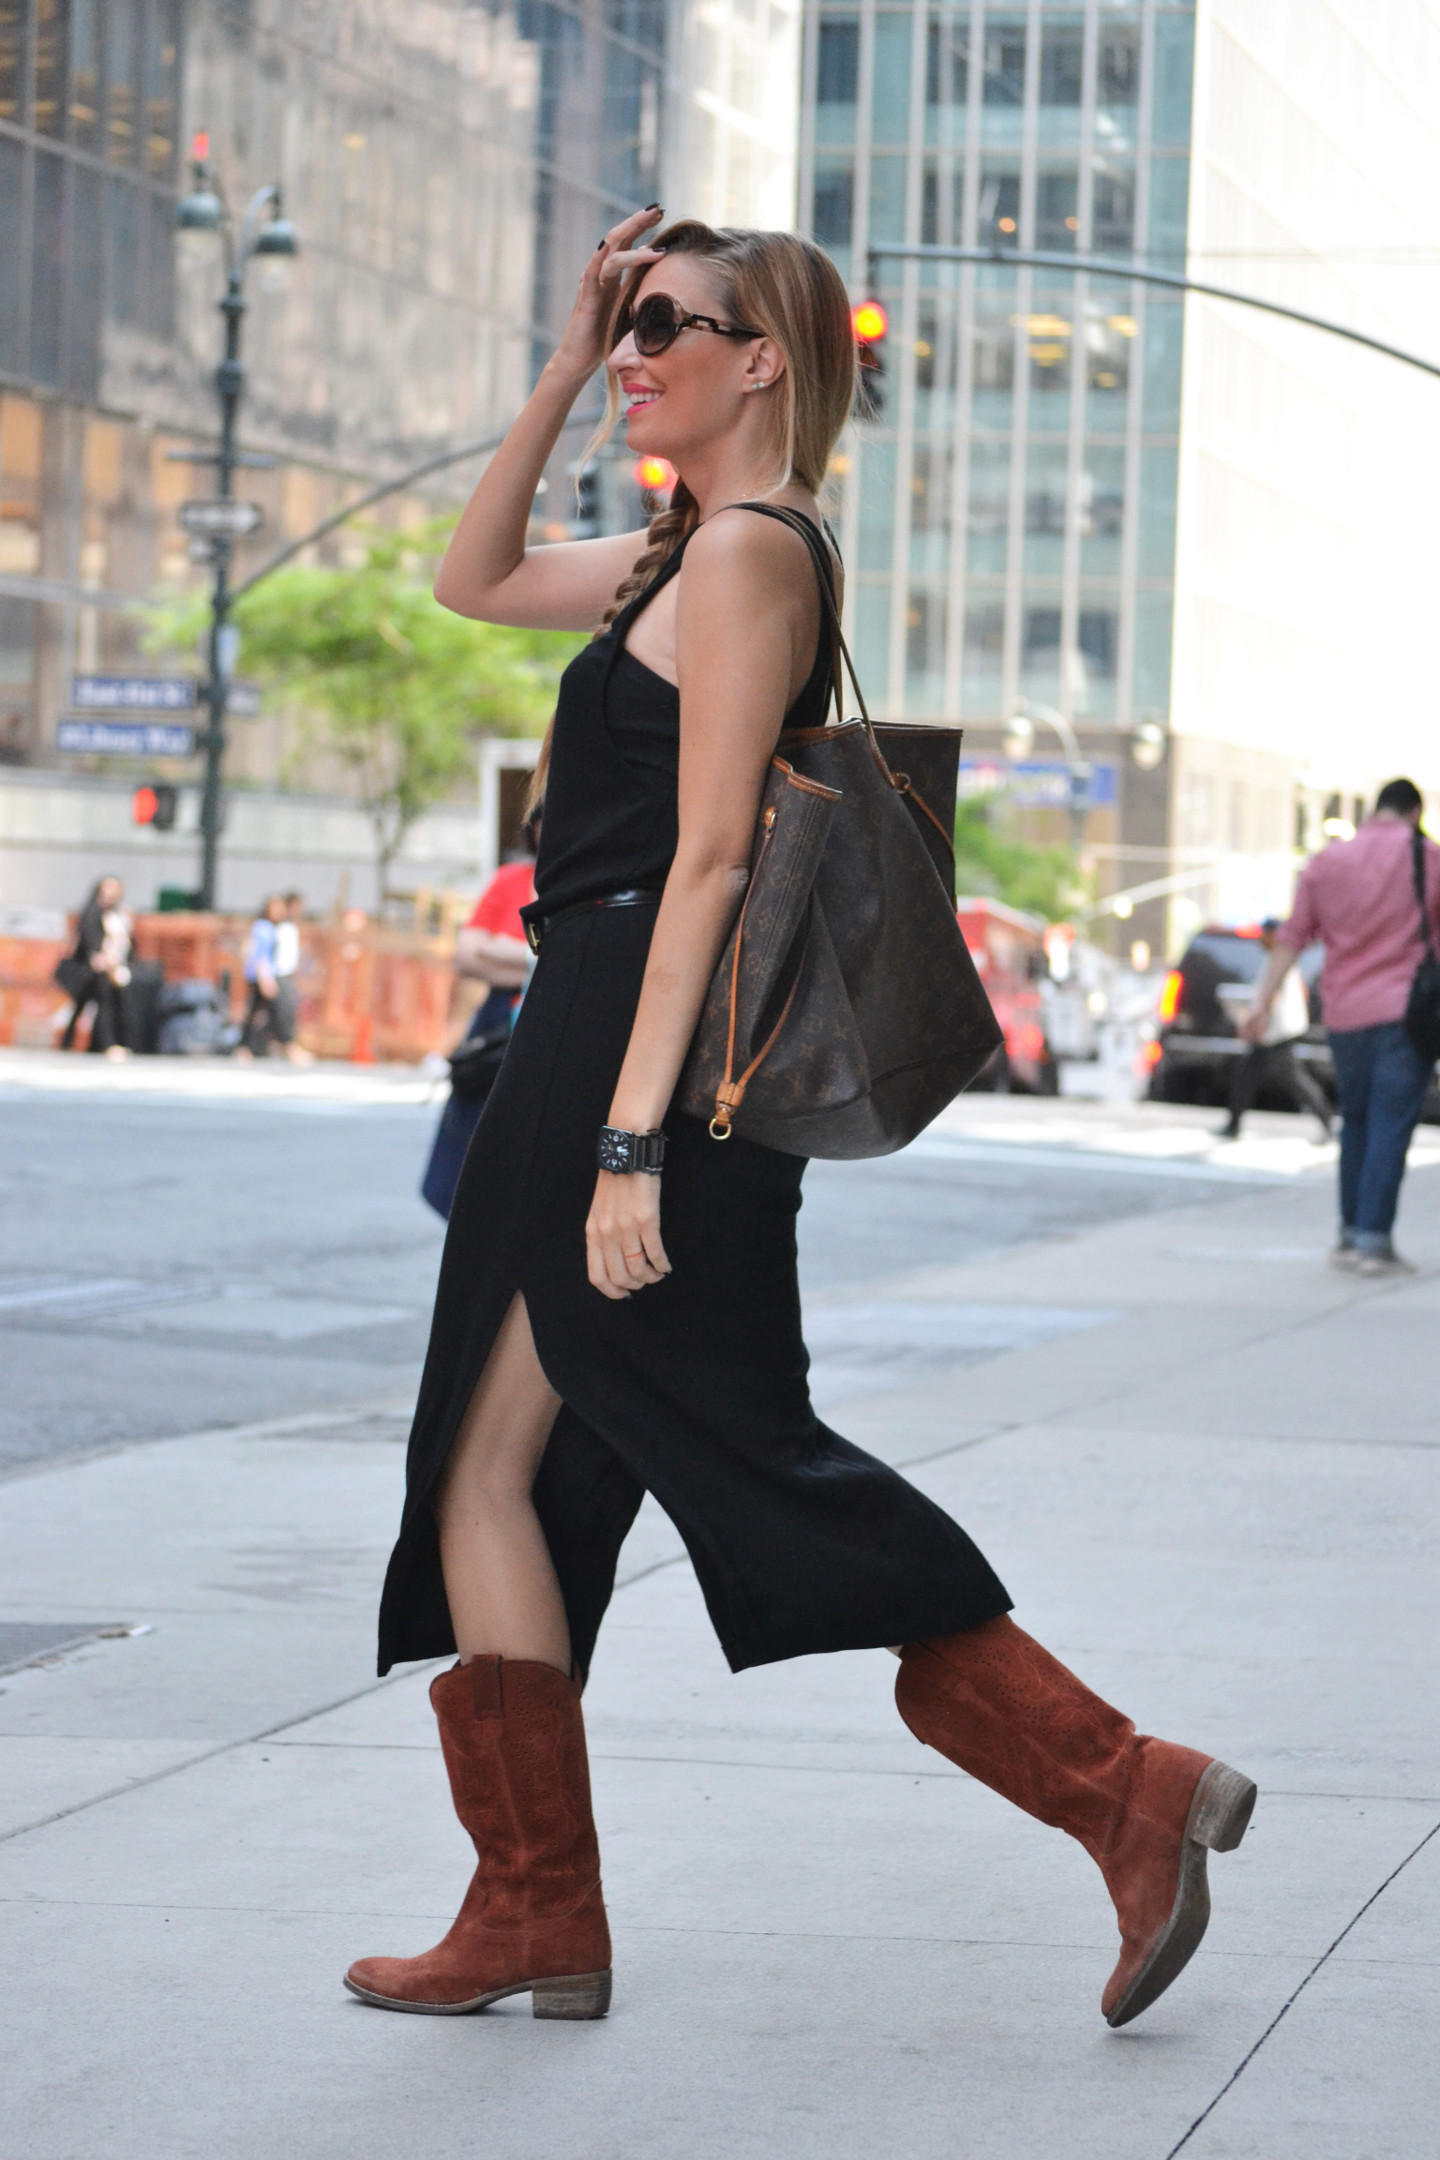 NAKD_LBD_Black_Dress_Lara_Martin_Gilarranz_Bymyheels_NYC (1)